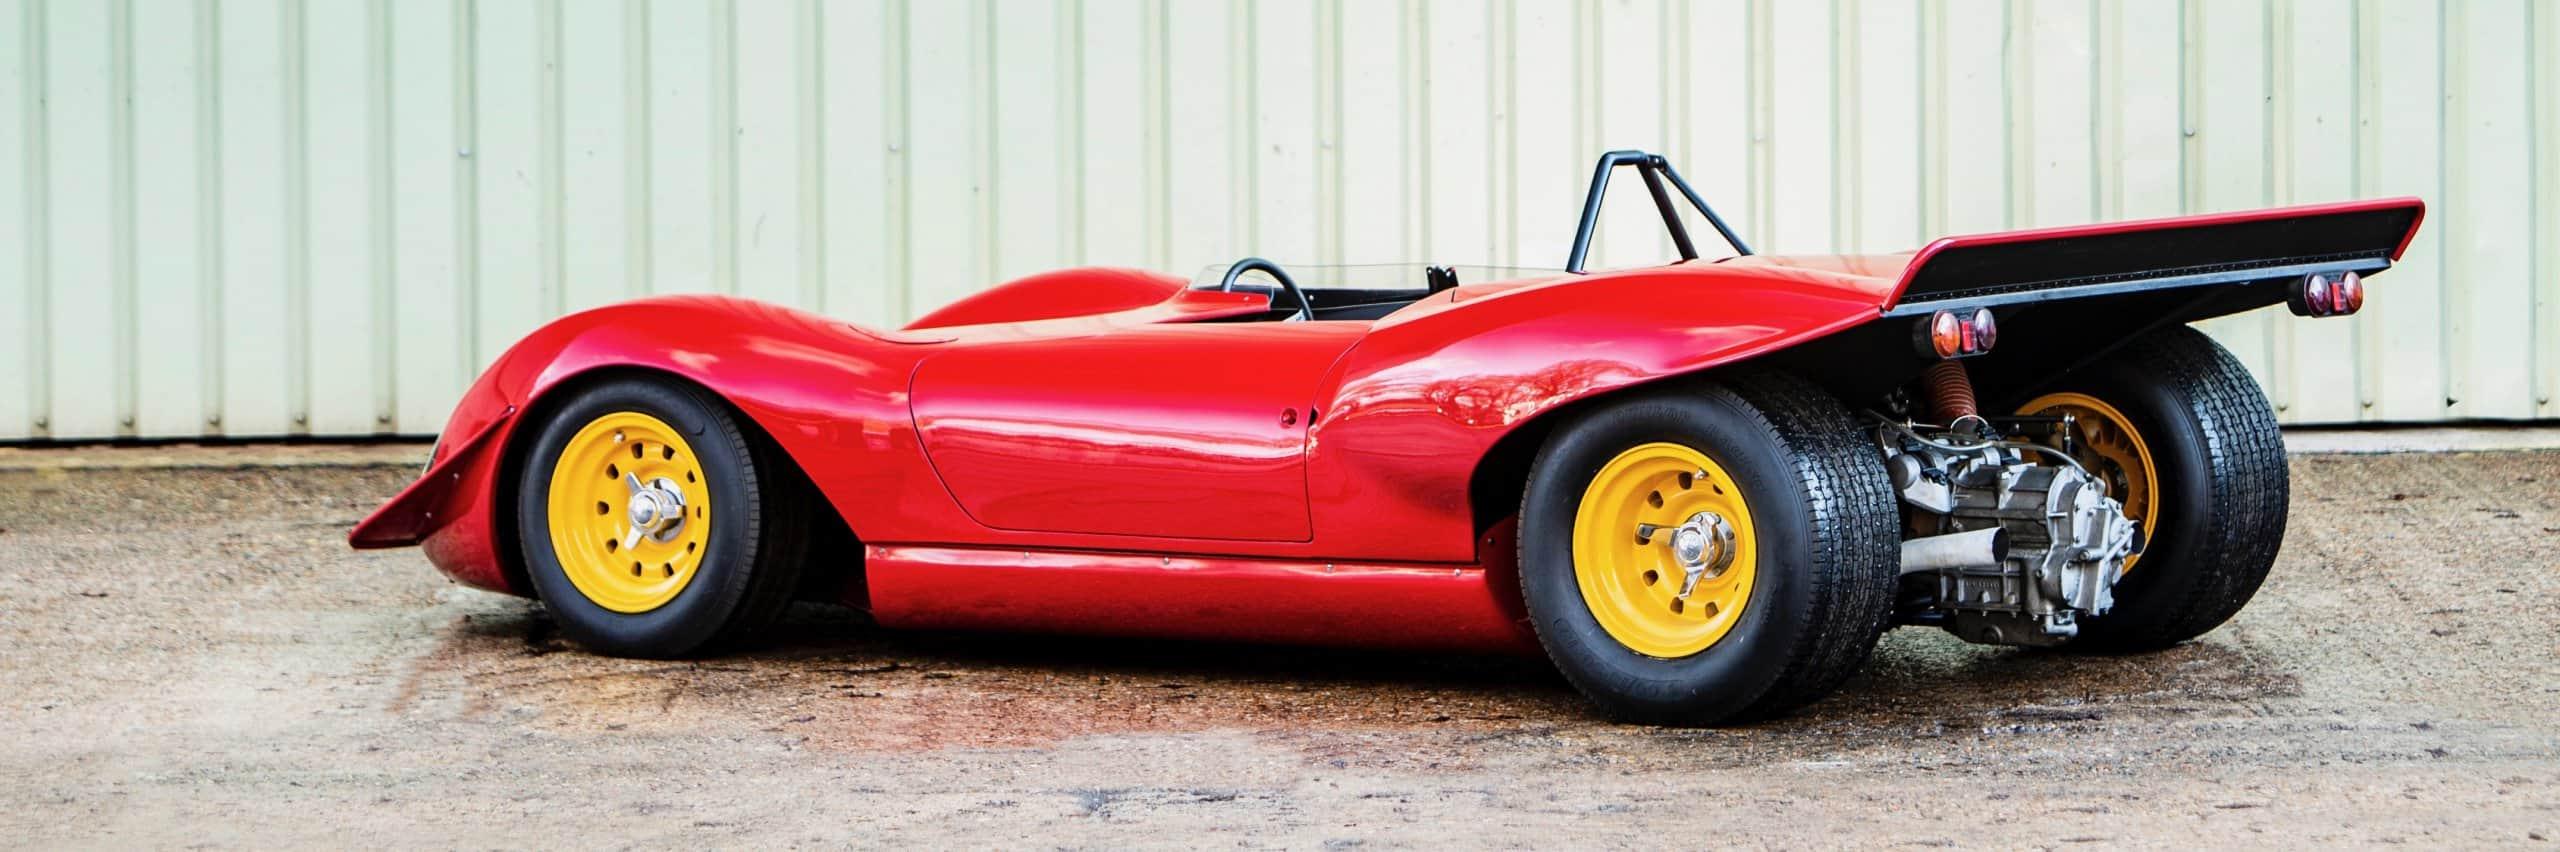 Ferrari Dino, Bonhams offers 1966 Ferrari Dino sports prototype racer at Paris auction, ClassicCars.com Journal